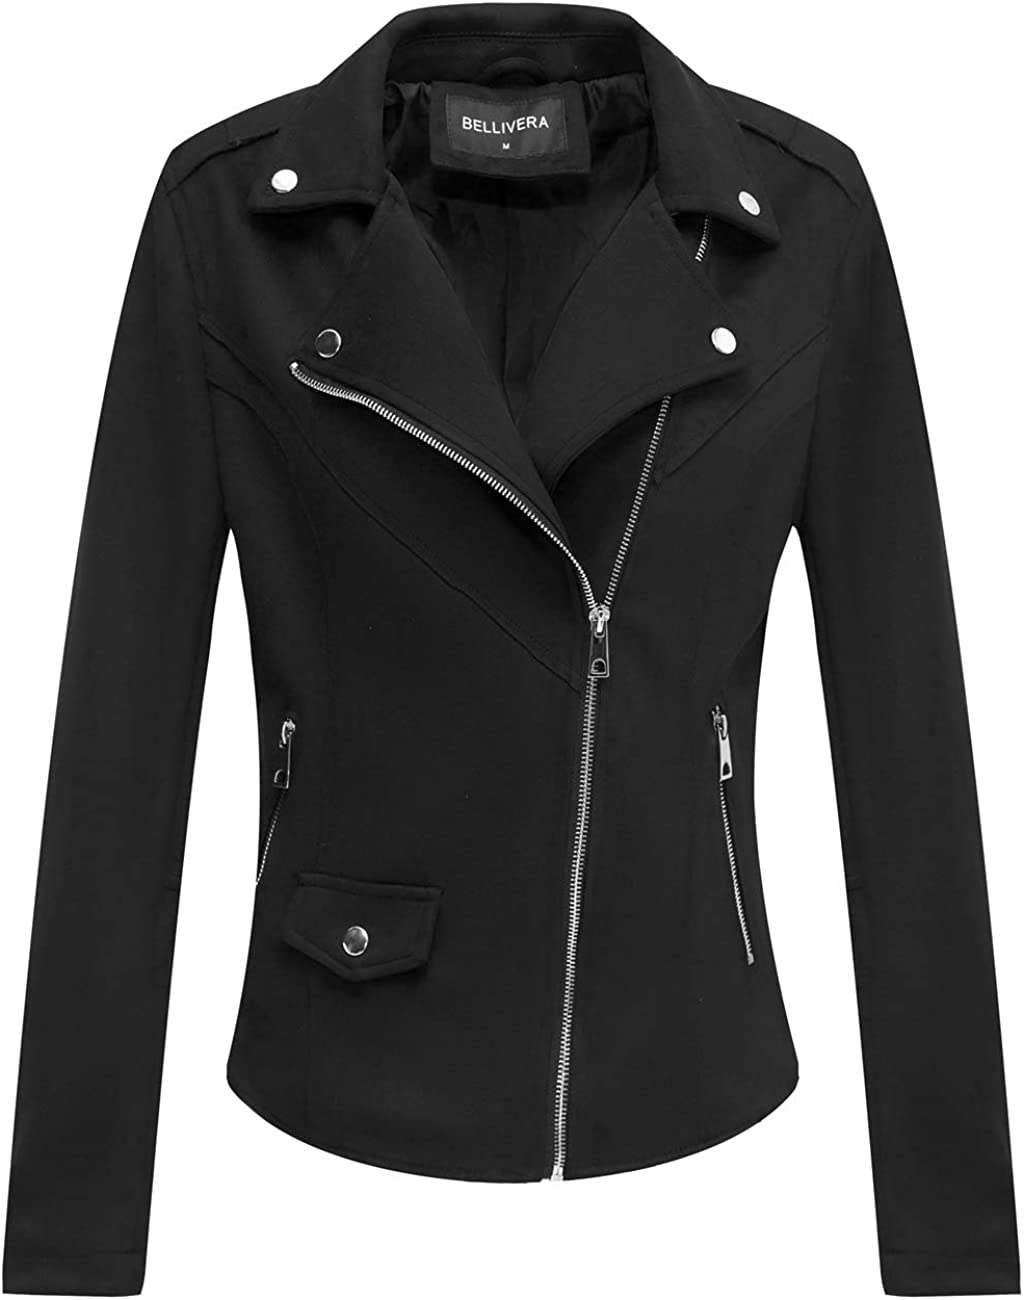 Bellivera Faux Suede Jackets for Beauty products Women Short Moto service Biker wi Coat